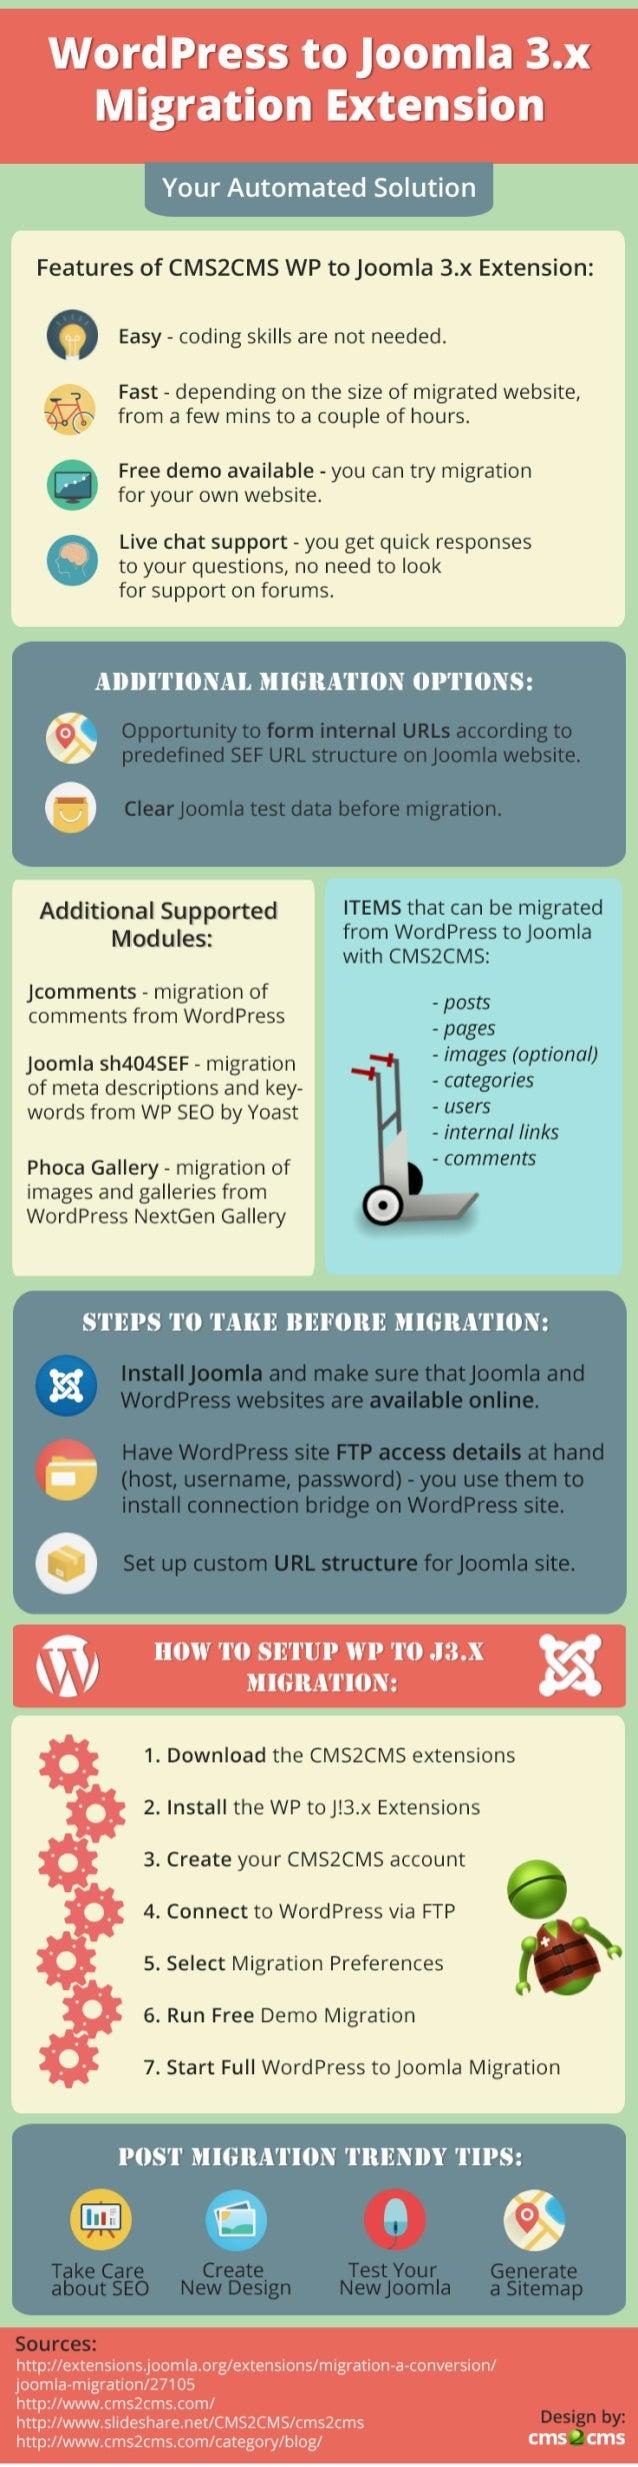 WordPress to Joomla Extension: How It Works